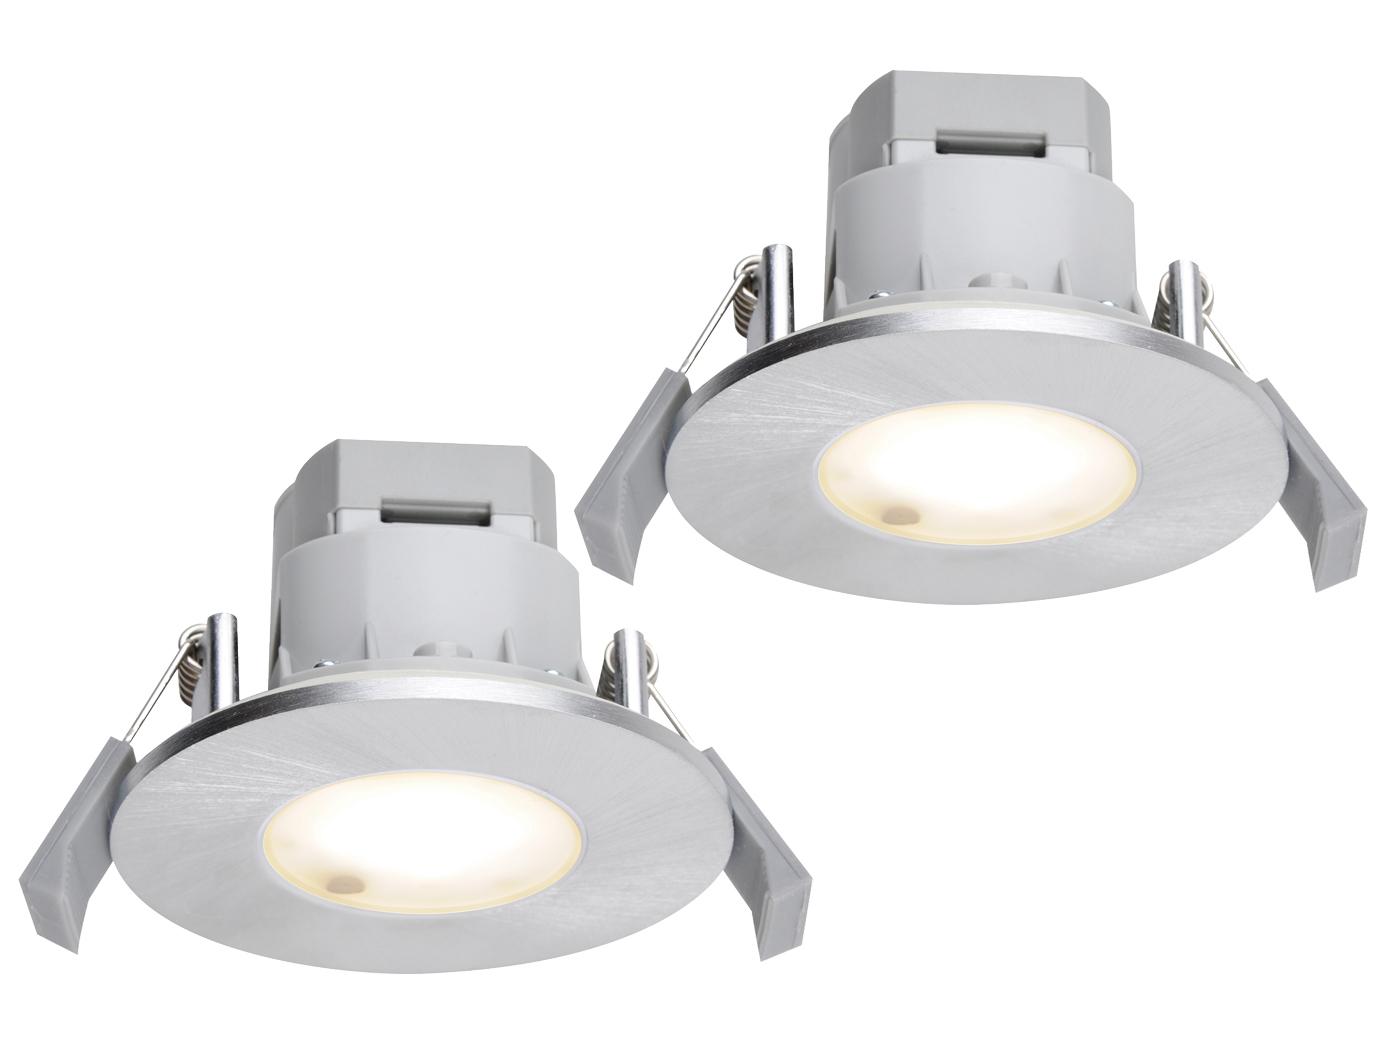 Led Einbaustrahler Decke 2er Set Rund Aluminium Gebürstet 5 5w Ip65 Badlampen